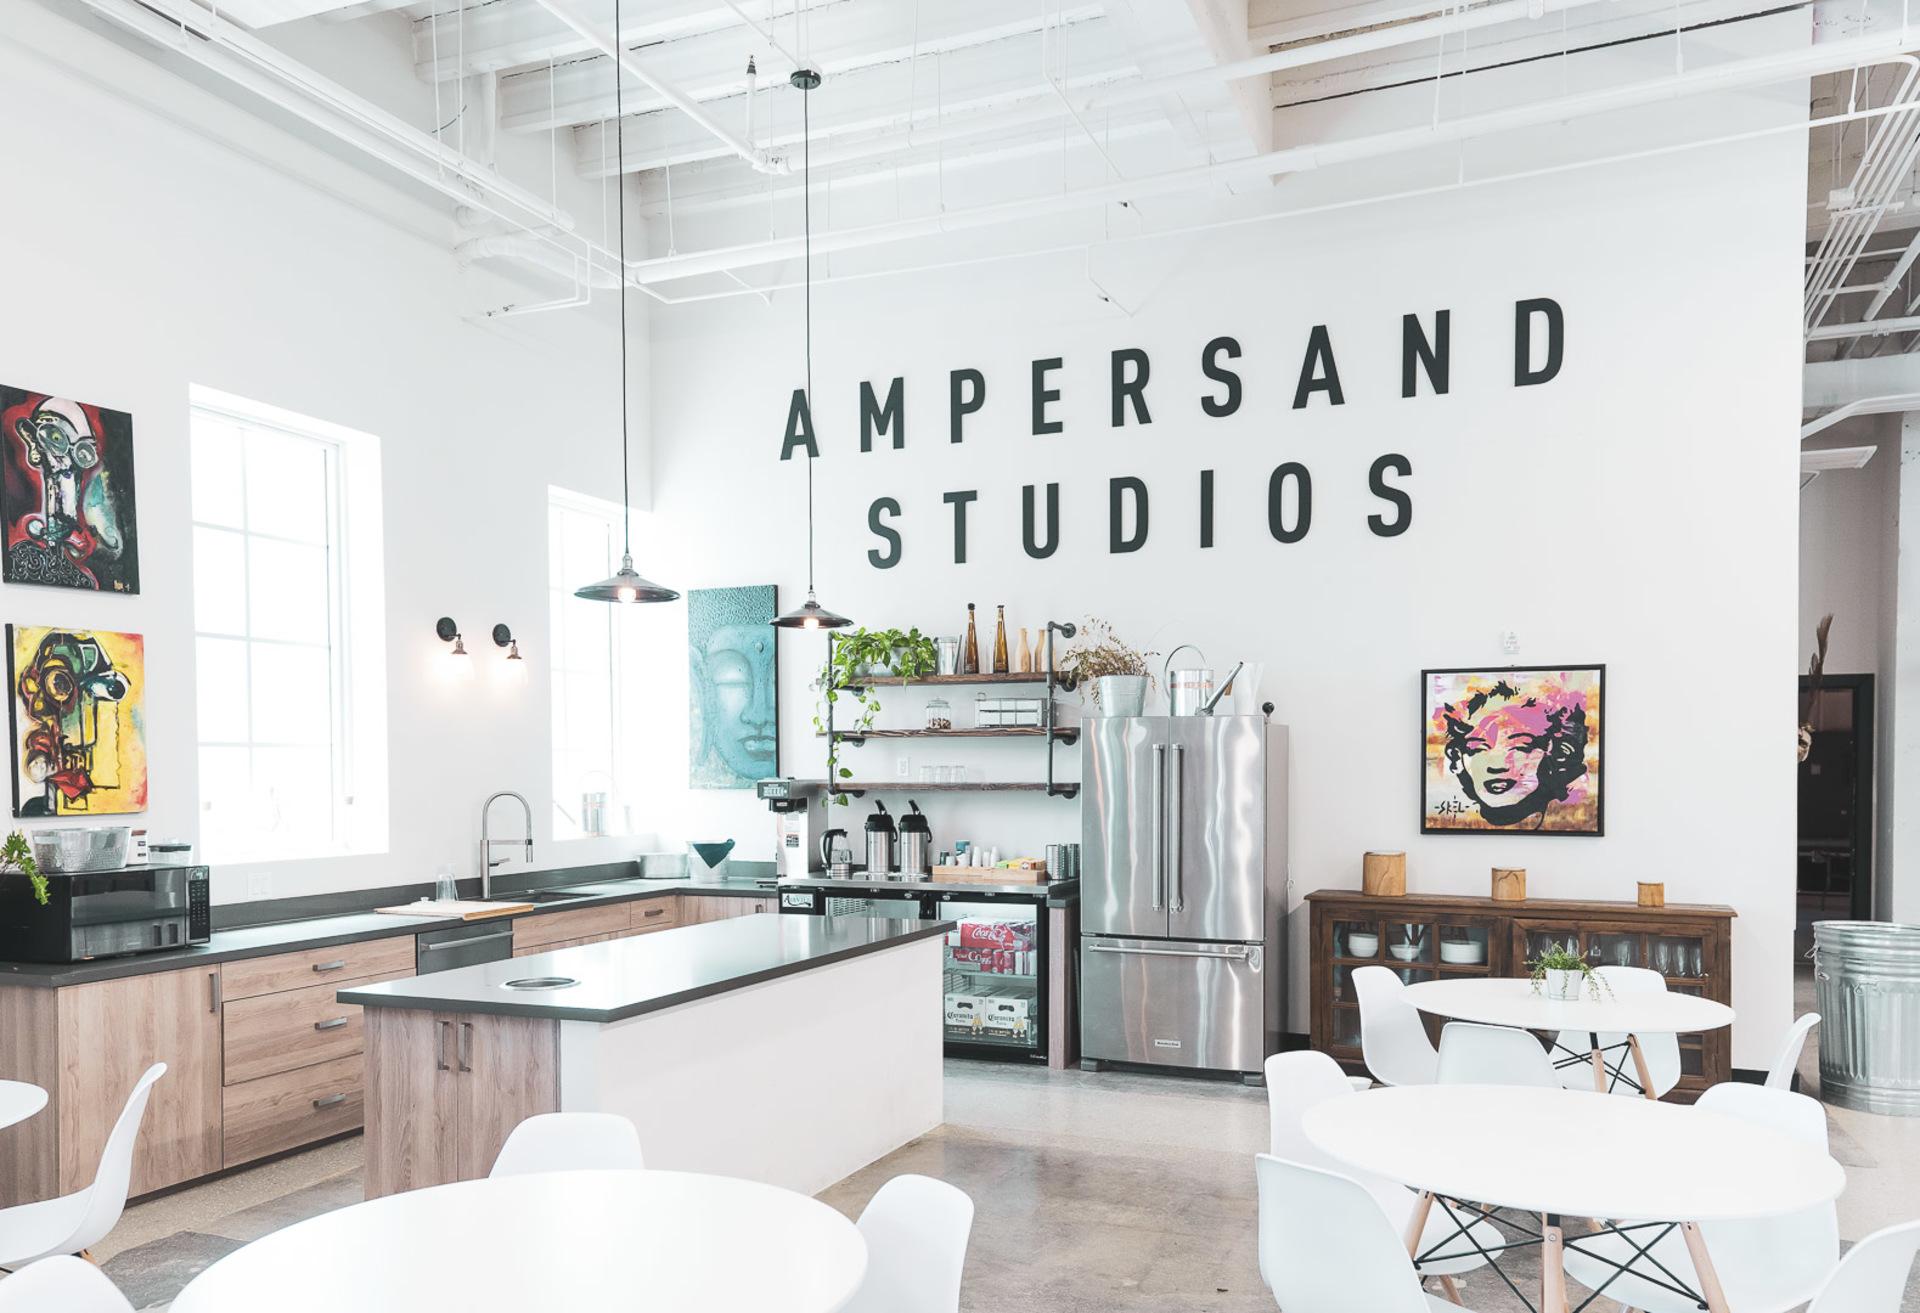 Studio La Rosa Palermo ampersand studios, miami - book online - coworker